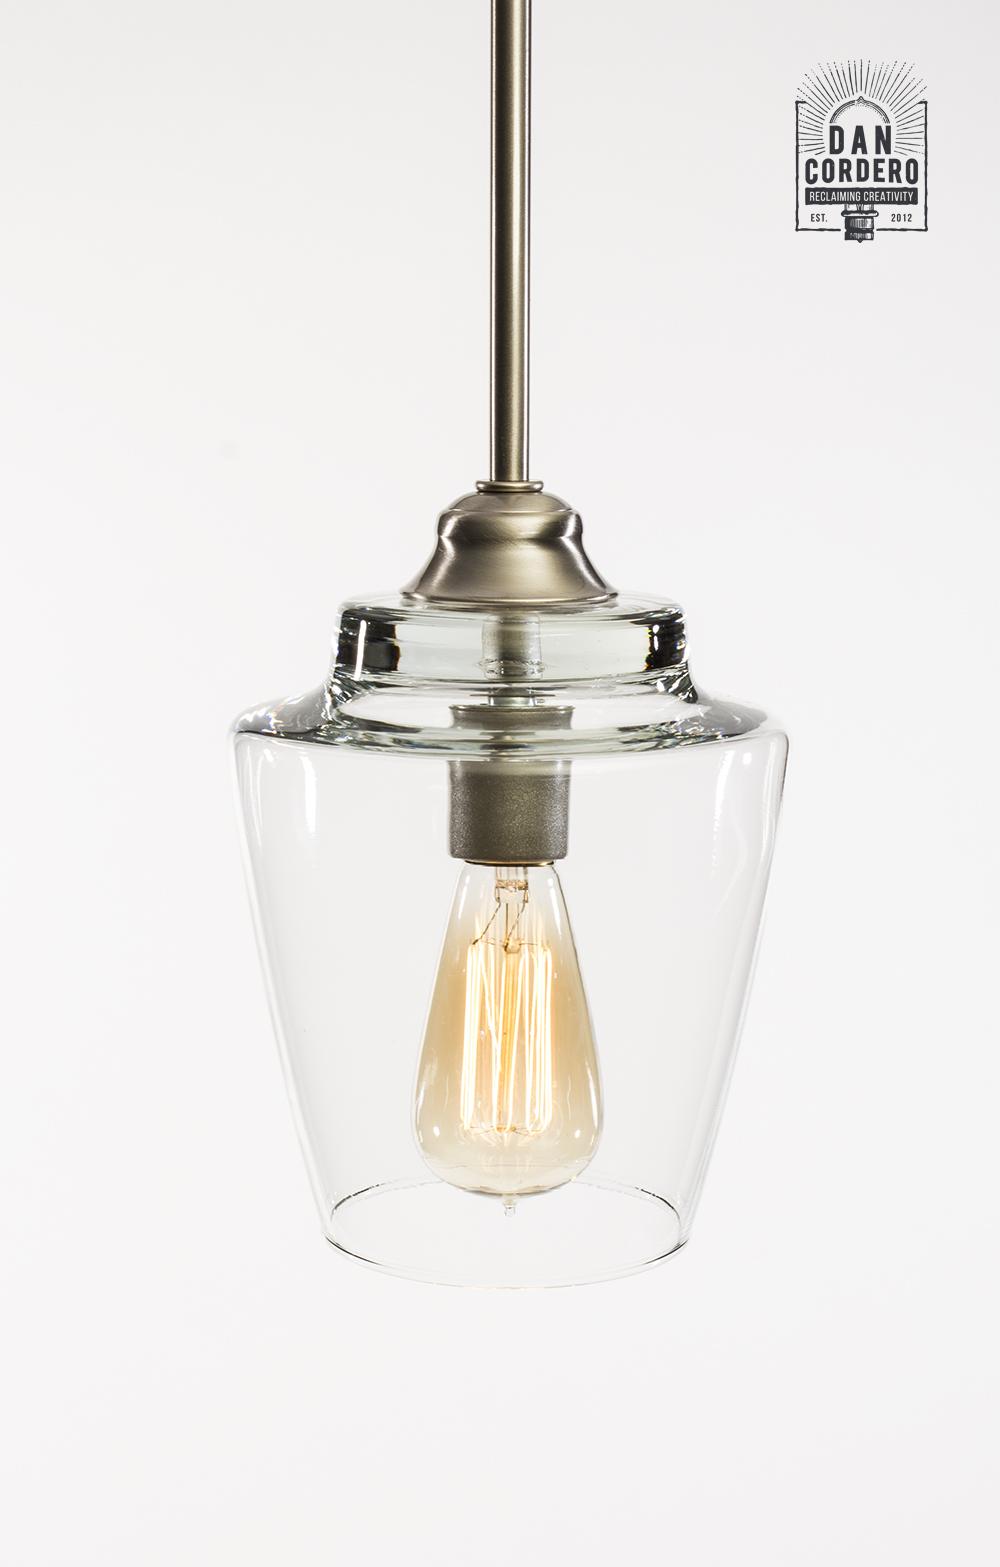 online retailer 83668 b1093 Glass Pendant Light Fixture   2 Finishes   Small Hurricane Shade